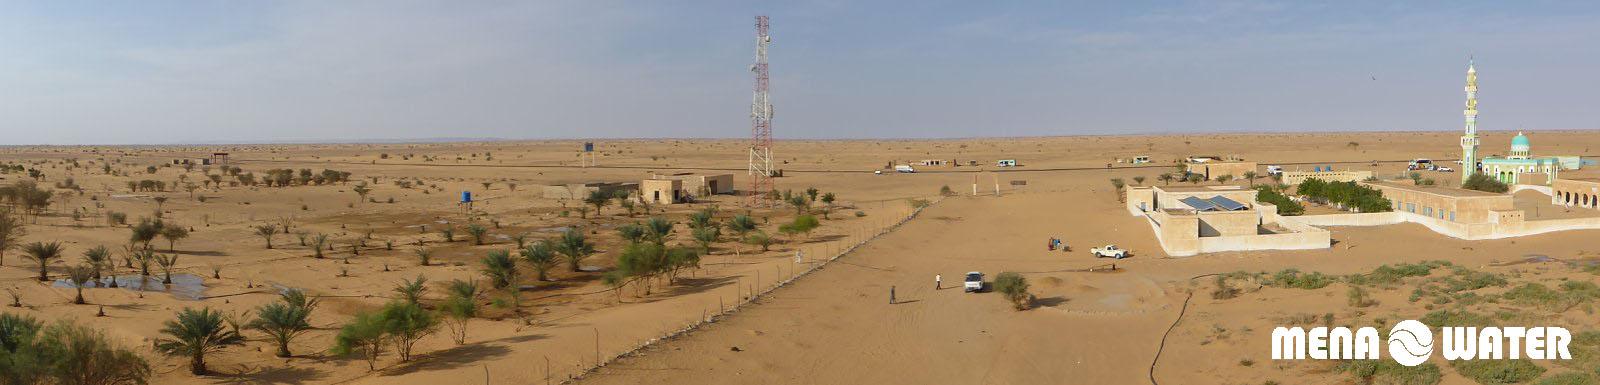 solar plant in Sudan